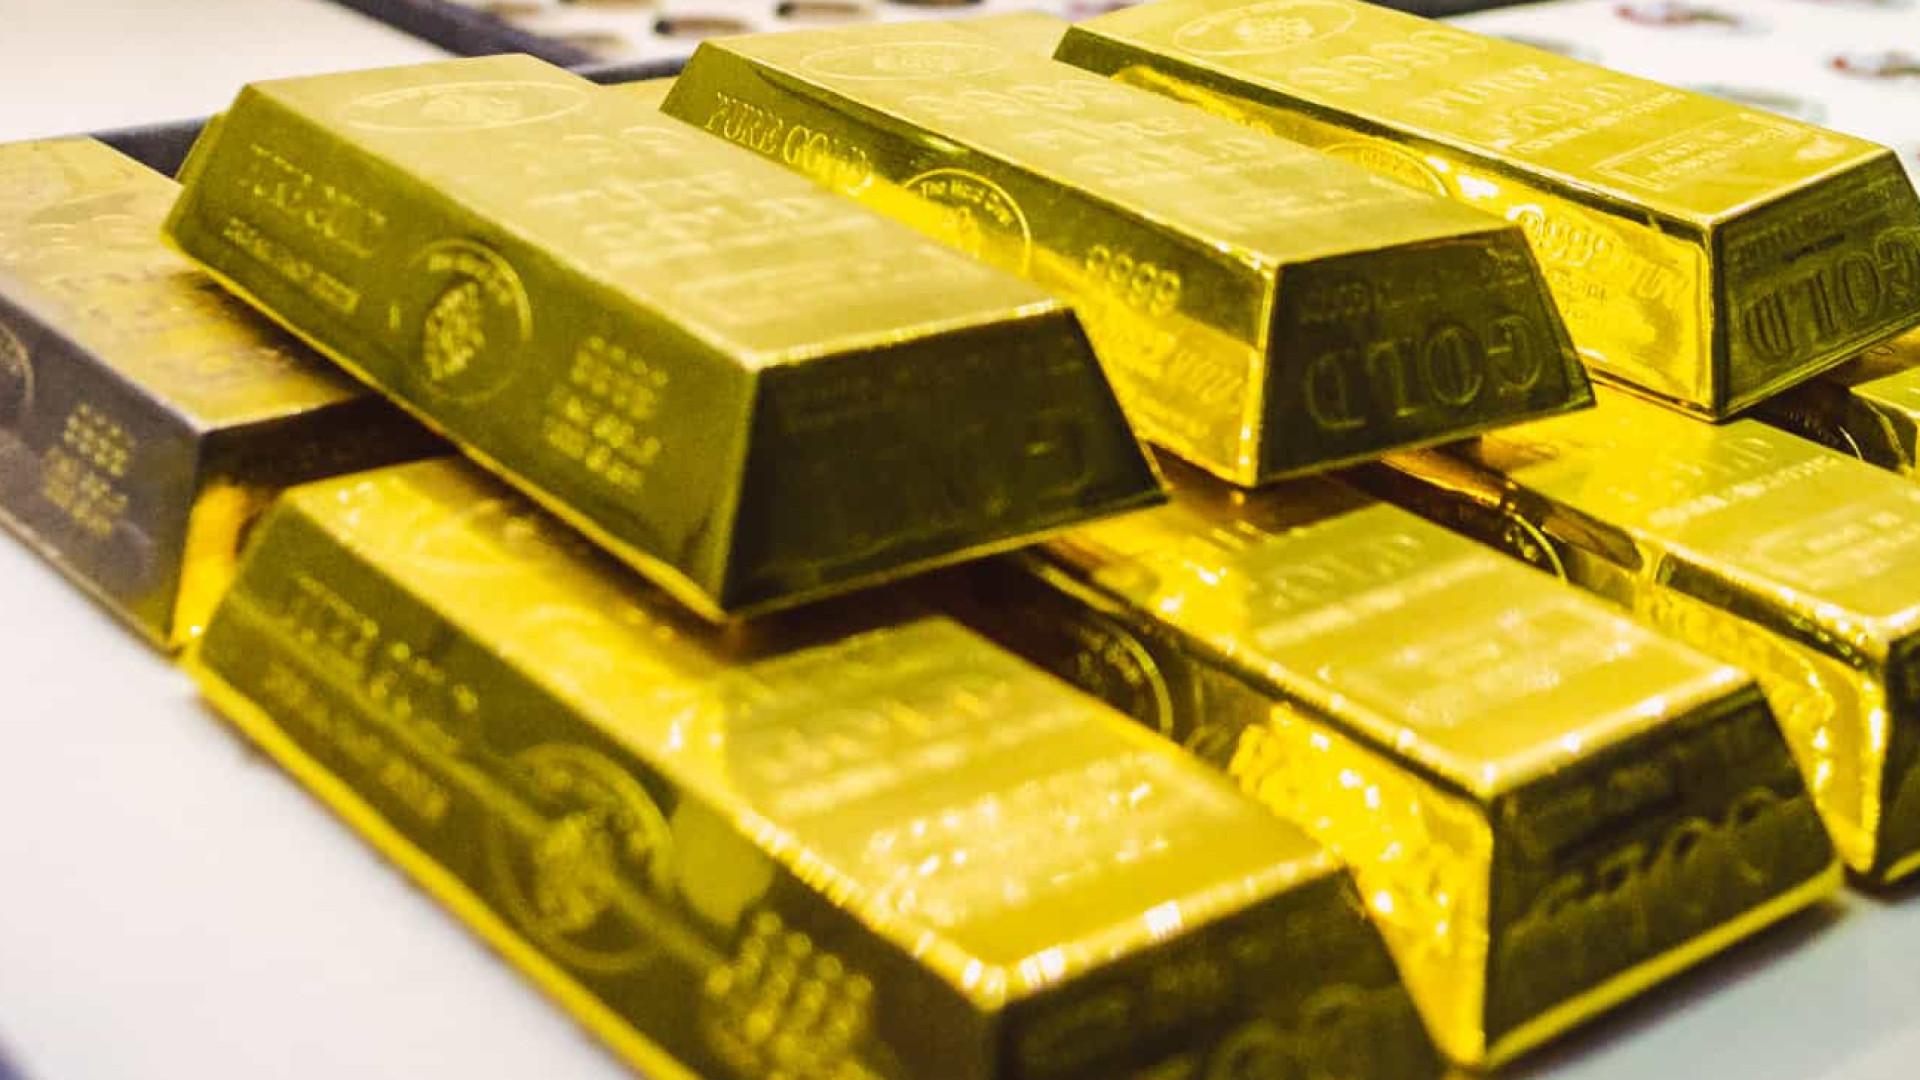 Polícia prende suspeito de participar de roubo de ouro em Guarulhos